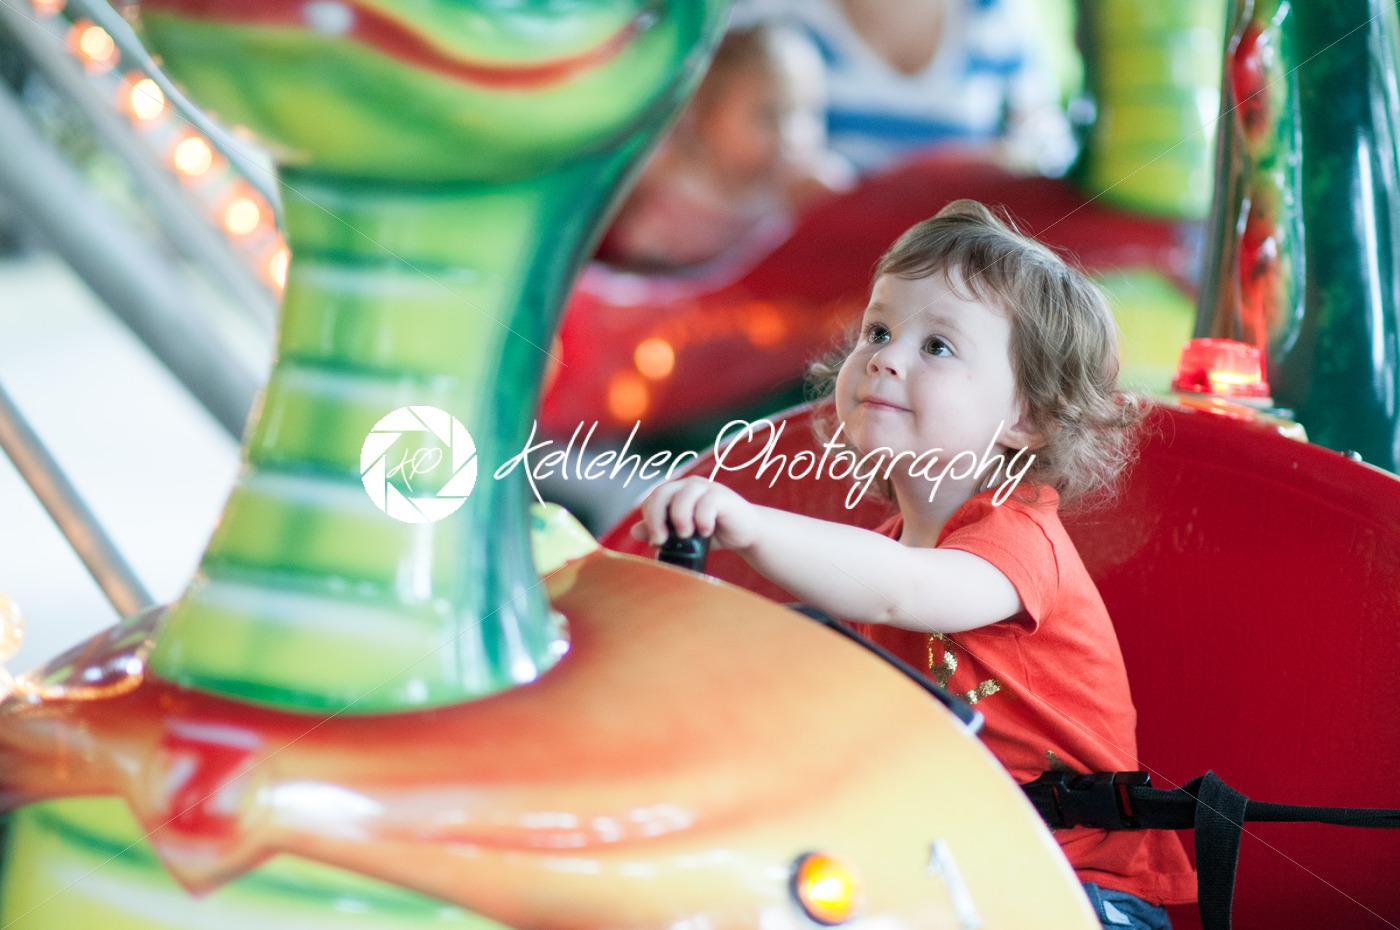 Young toddler girl having fun on boardwalk amusement ride - Kelleher Photography Store